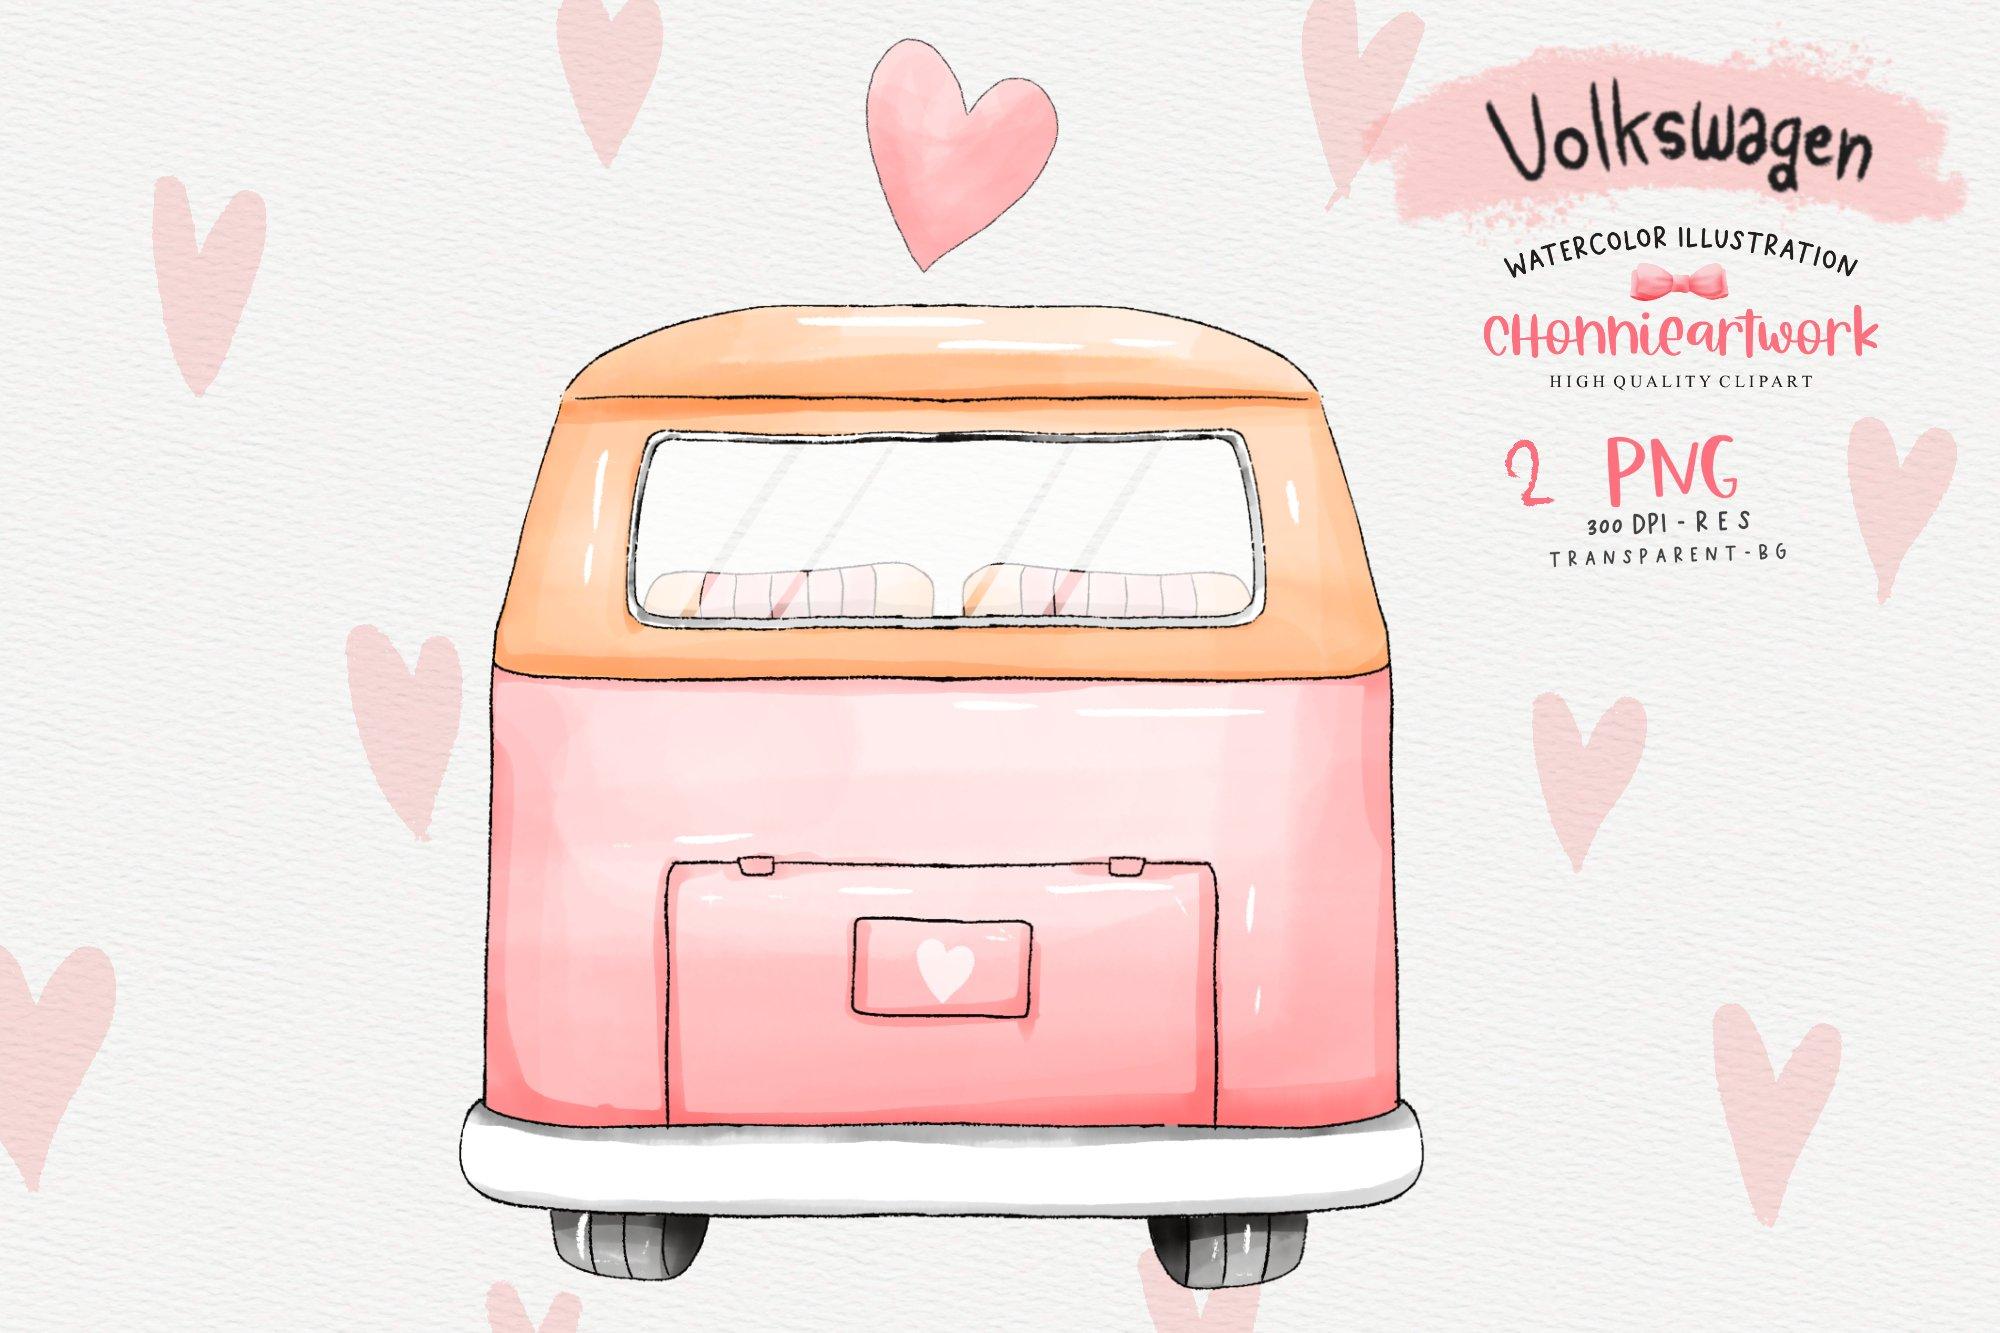 Download Watercolor Pink Volkswagen Van Sublimation Designs 1164670 Illustrations Design Bundles